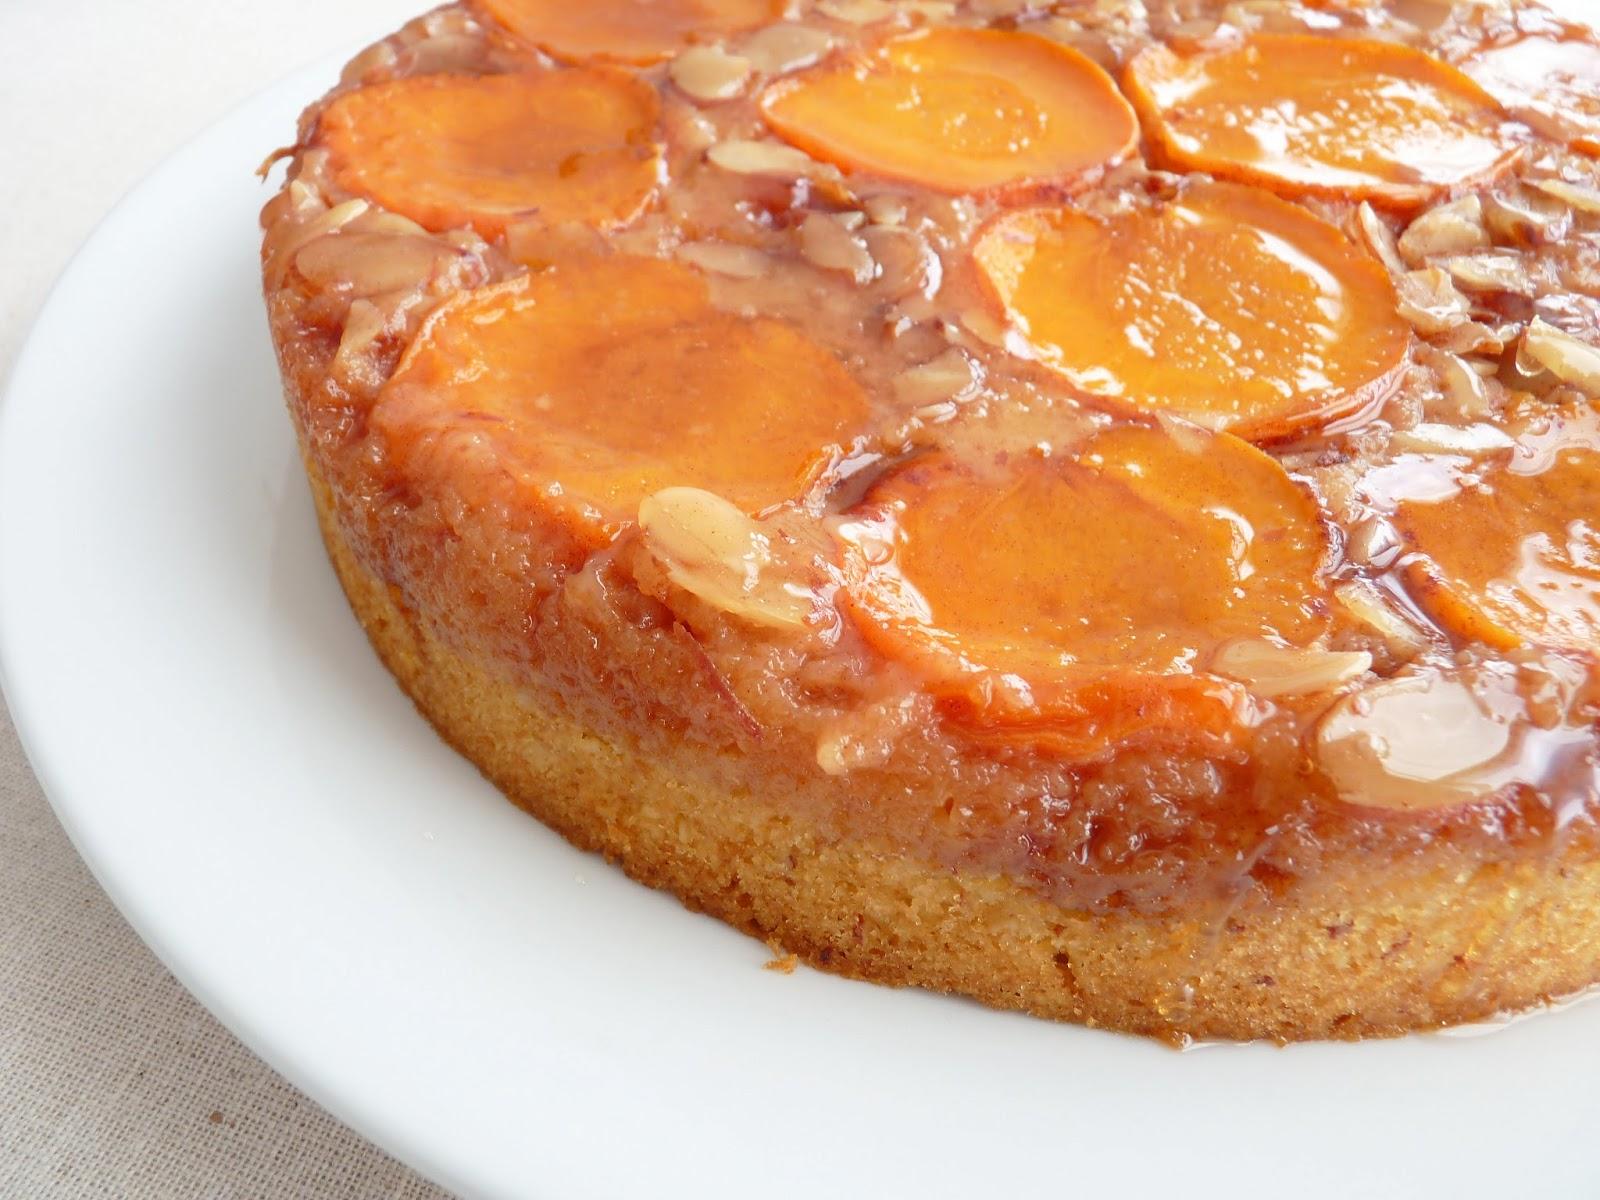 Apricot Upside Down Sponge Cake